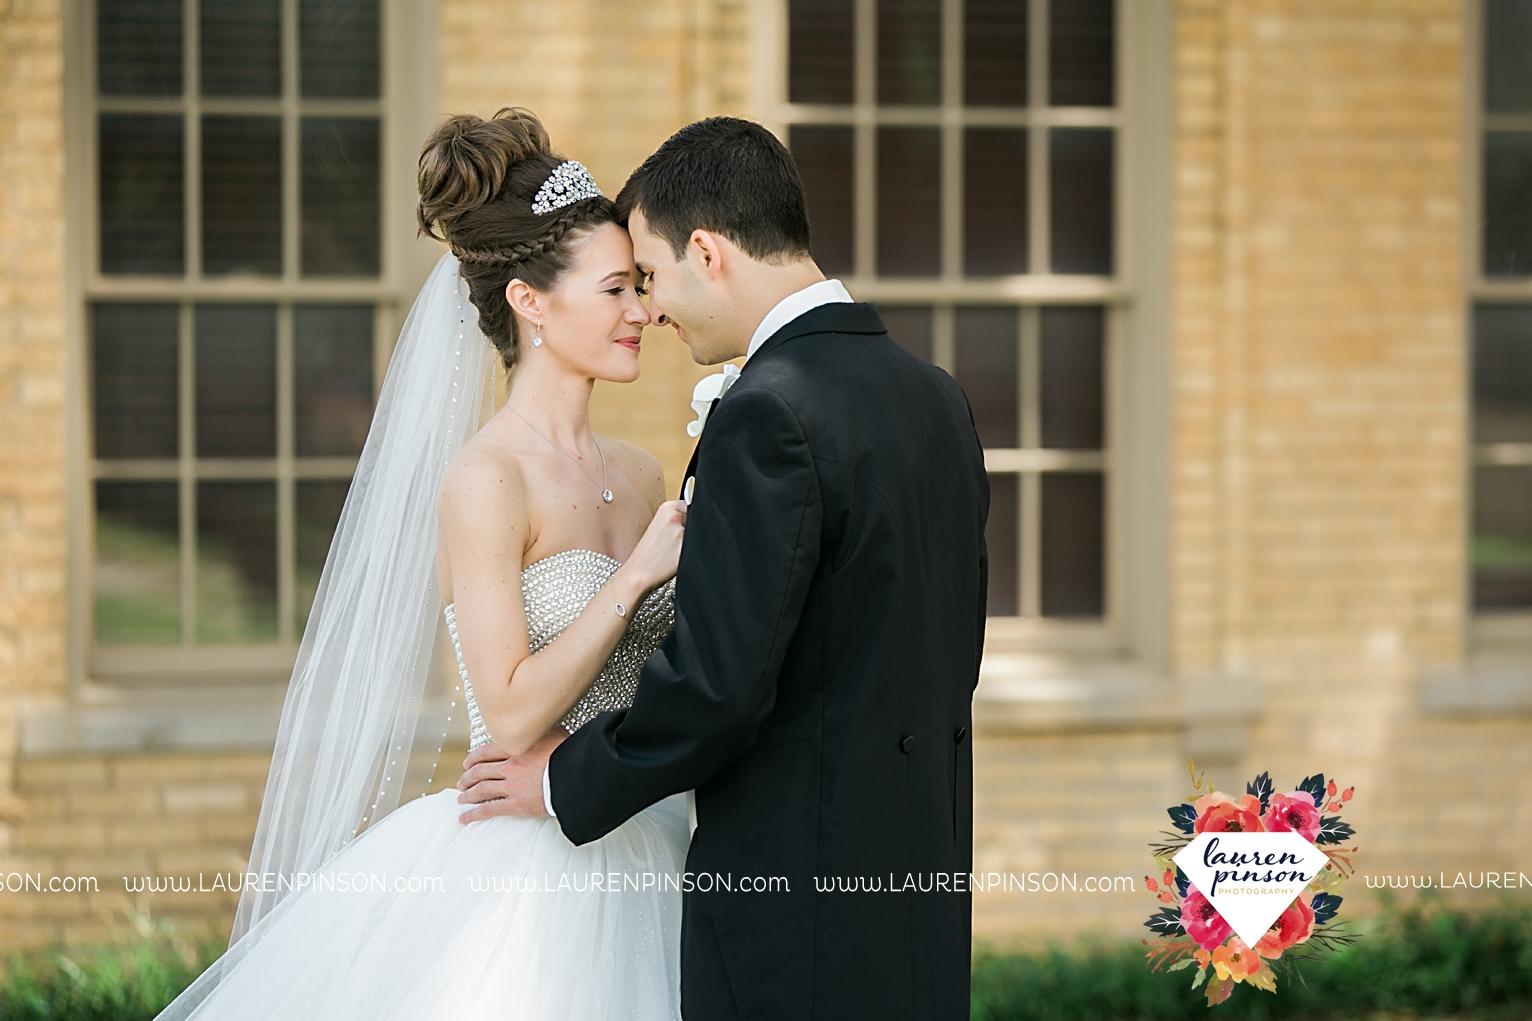 wichita-falls-texas-wedding-photographer-the-forum-by-the-kemp-mayfield-events-ulta-gold-glitter_2833.jpg